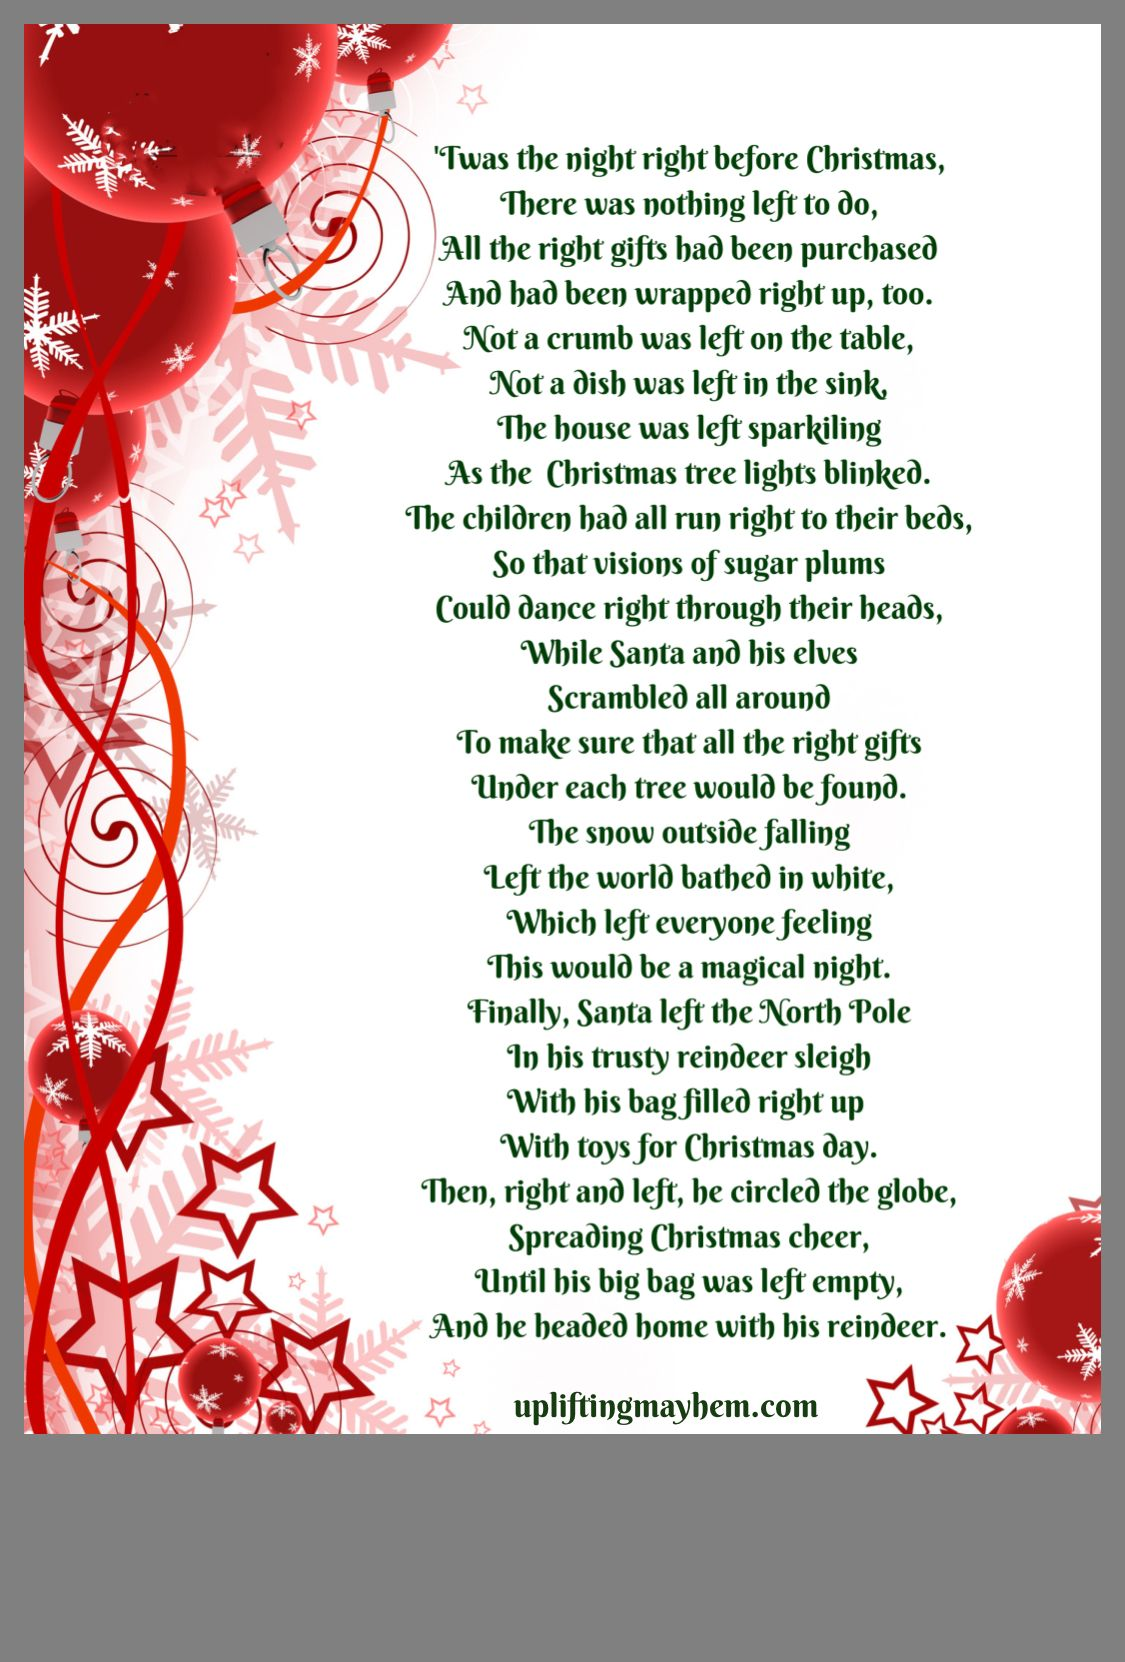 Pin by Michelle Kuznia on Christmas | Gift exchange poem ...